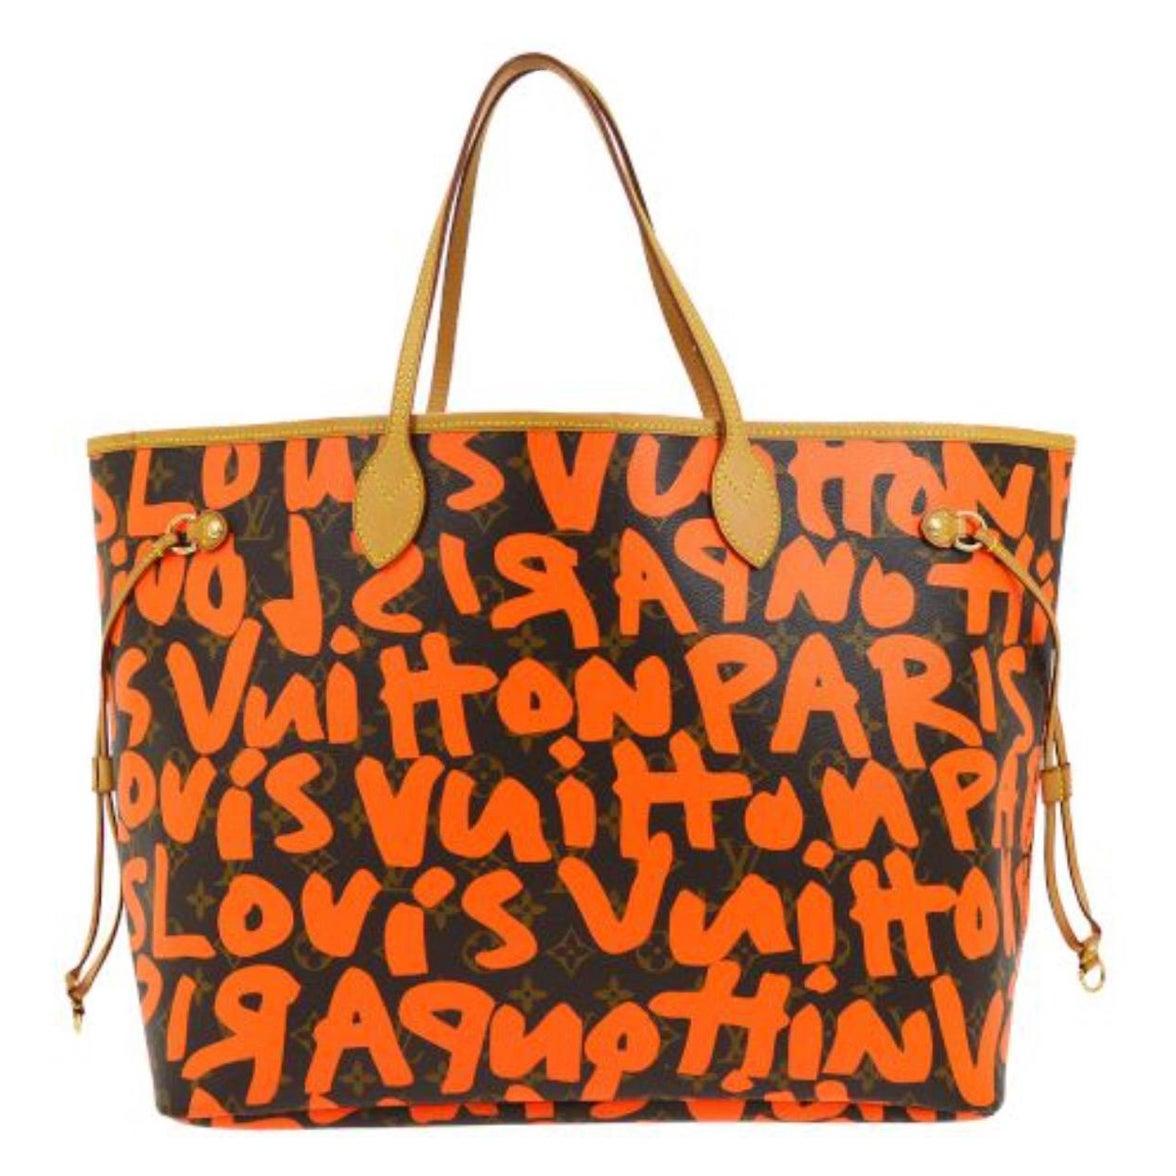 Louis Vuitton Neverfull GM Orange Graffiti Sprouse Carryall Travel Tote Bag